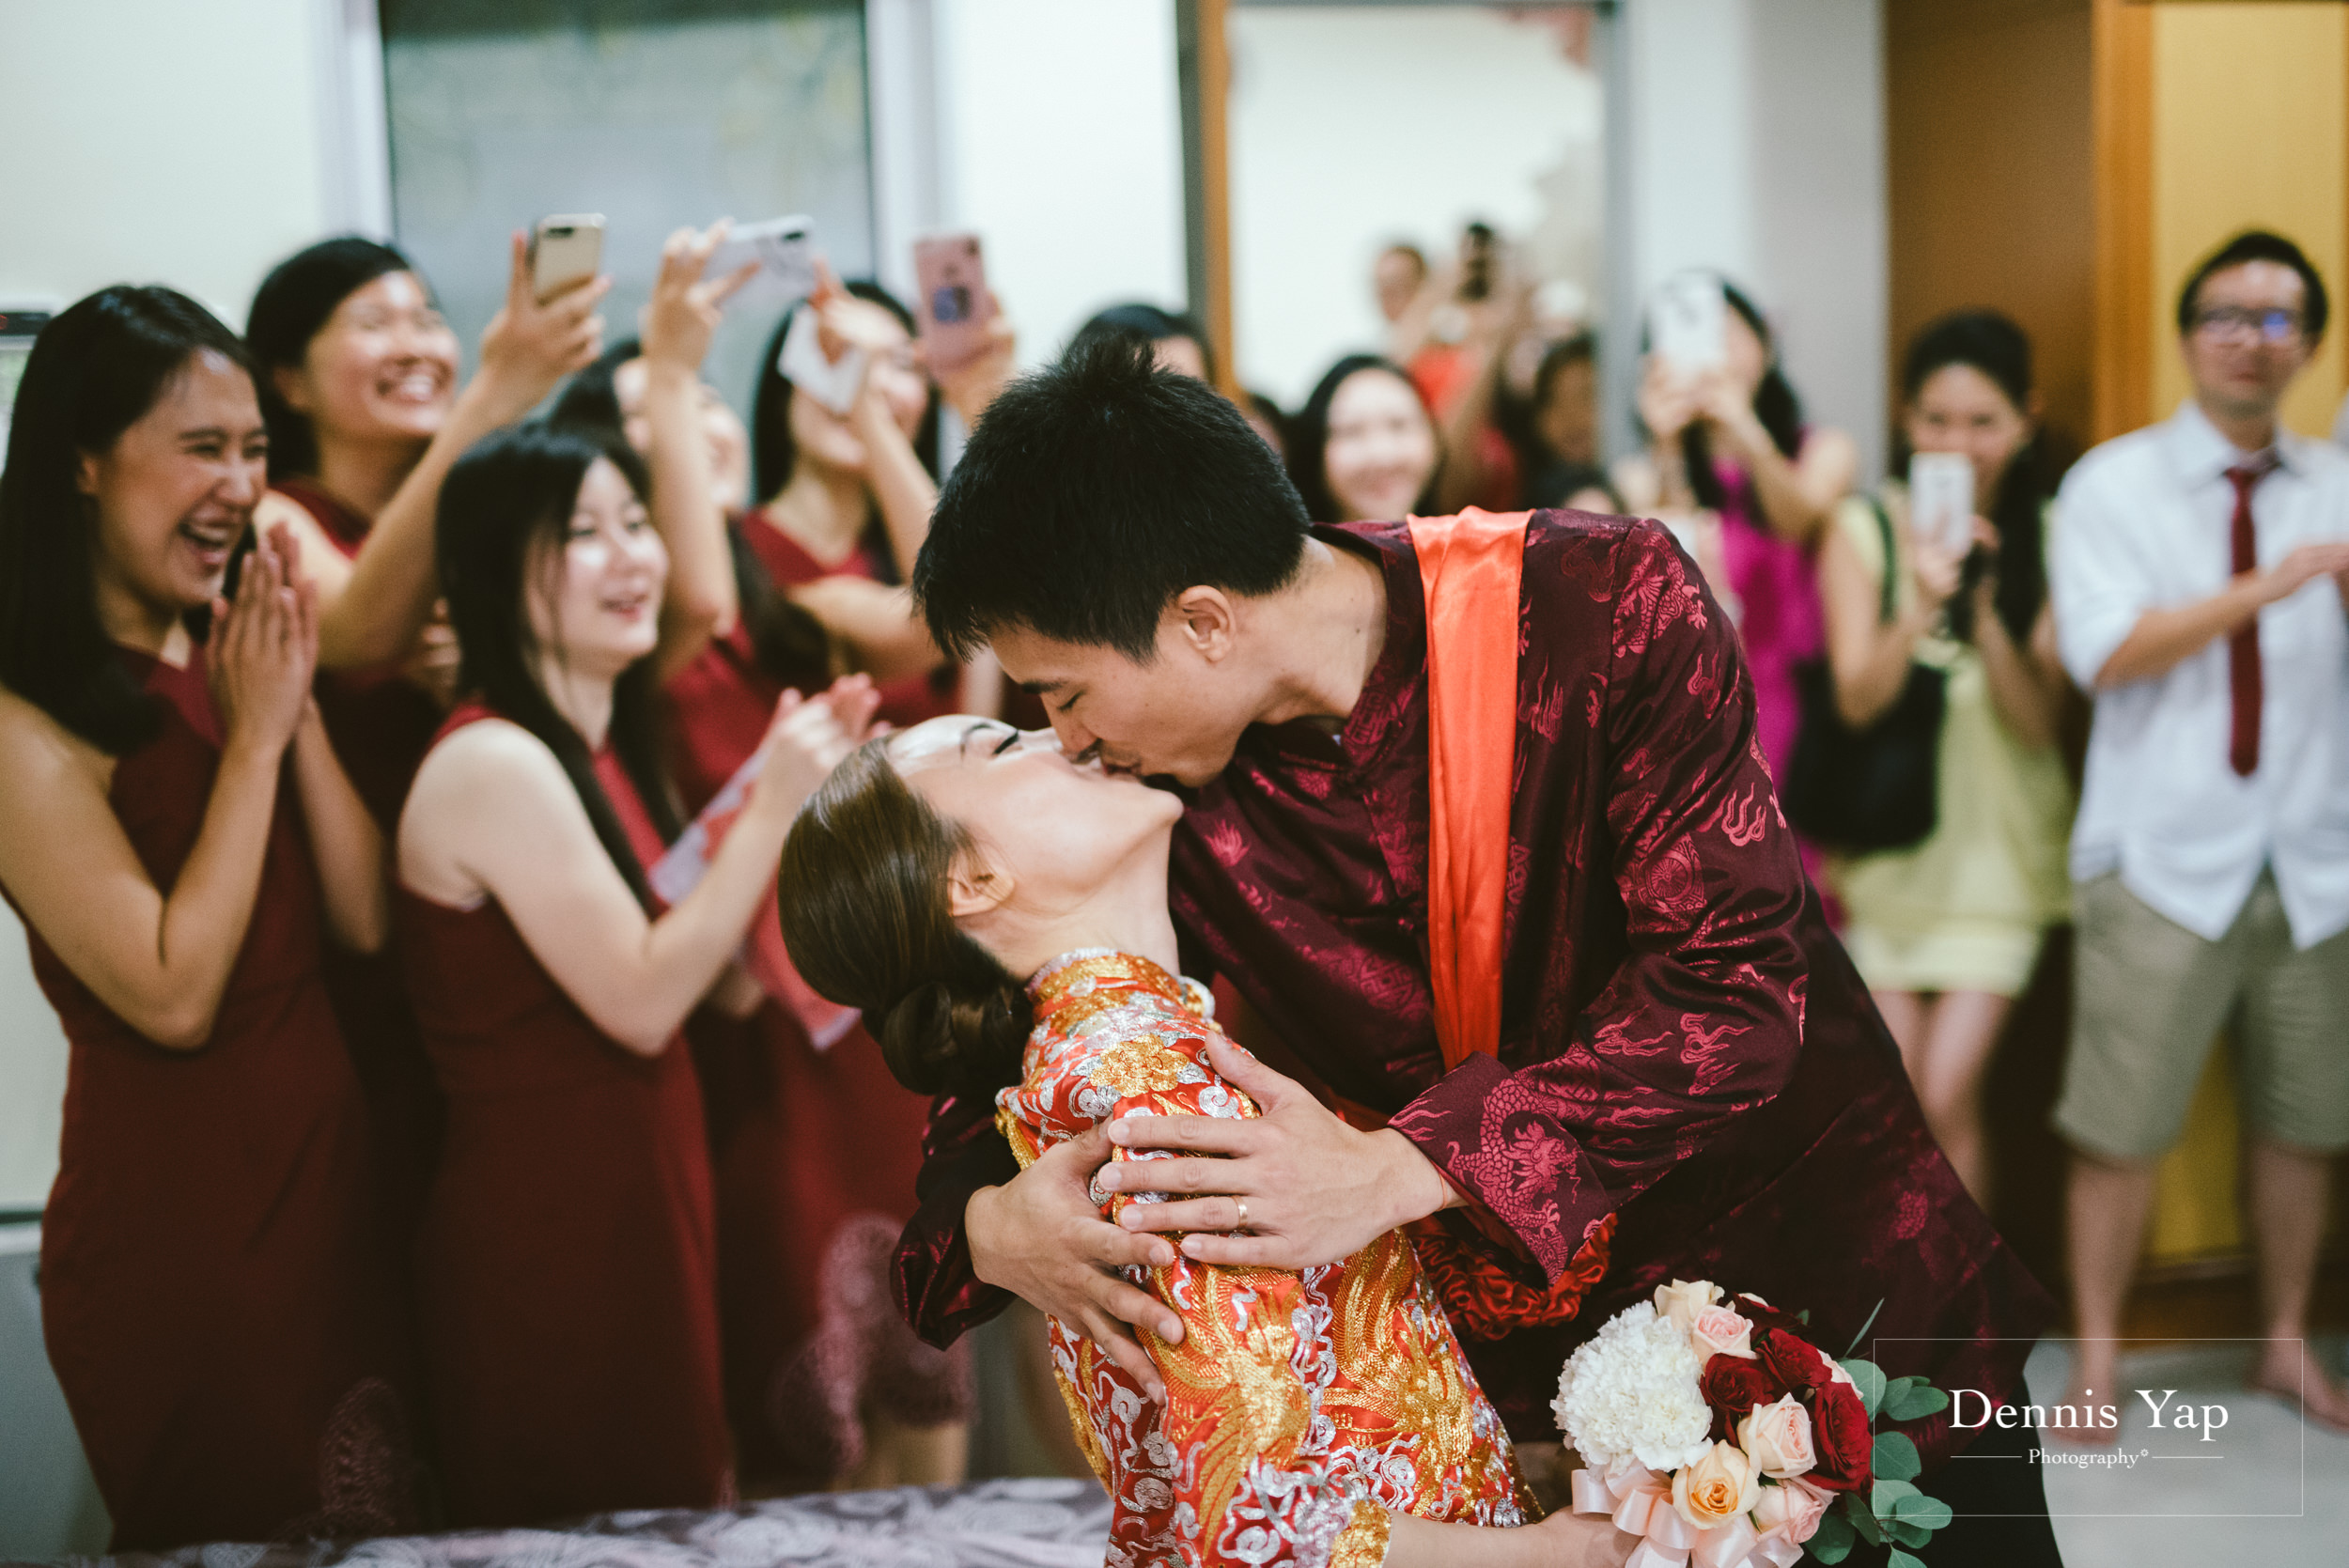 justin hsin wedding day ciao ristorante kuala lumpur dennis yap photography-13.jpg